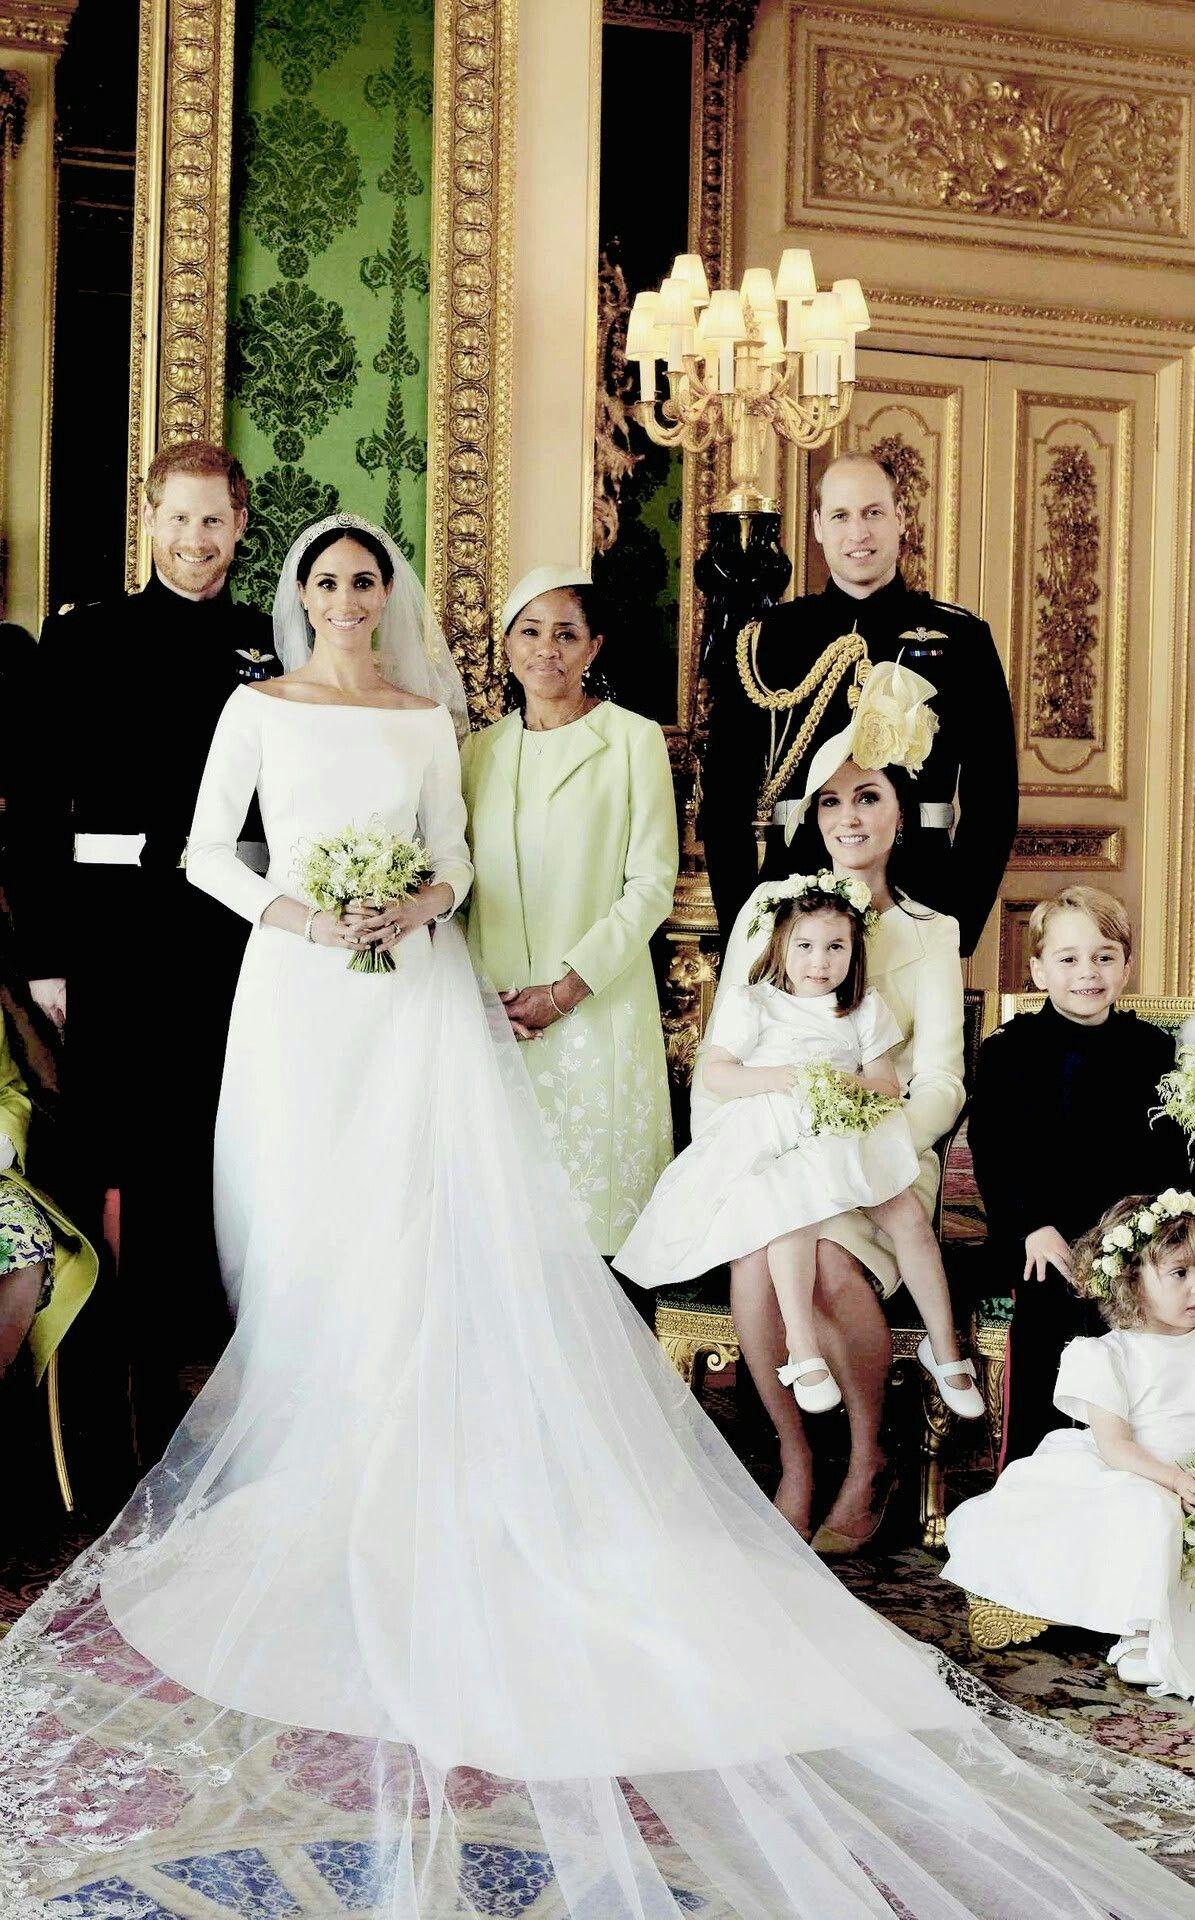 Megan And Harry Wedding.Pin By Elish123 On Looks Harry Meghan Wedding Royal Wedding